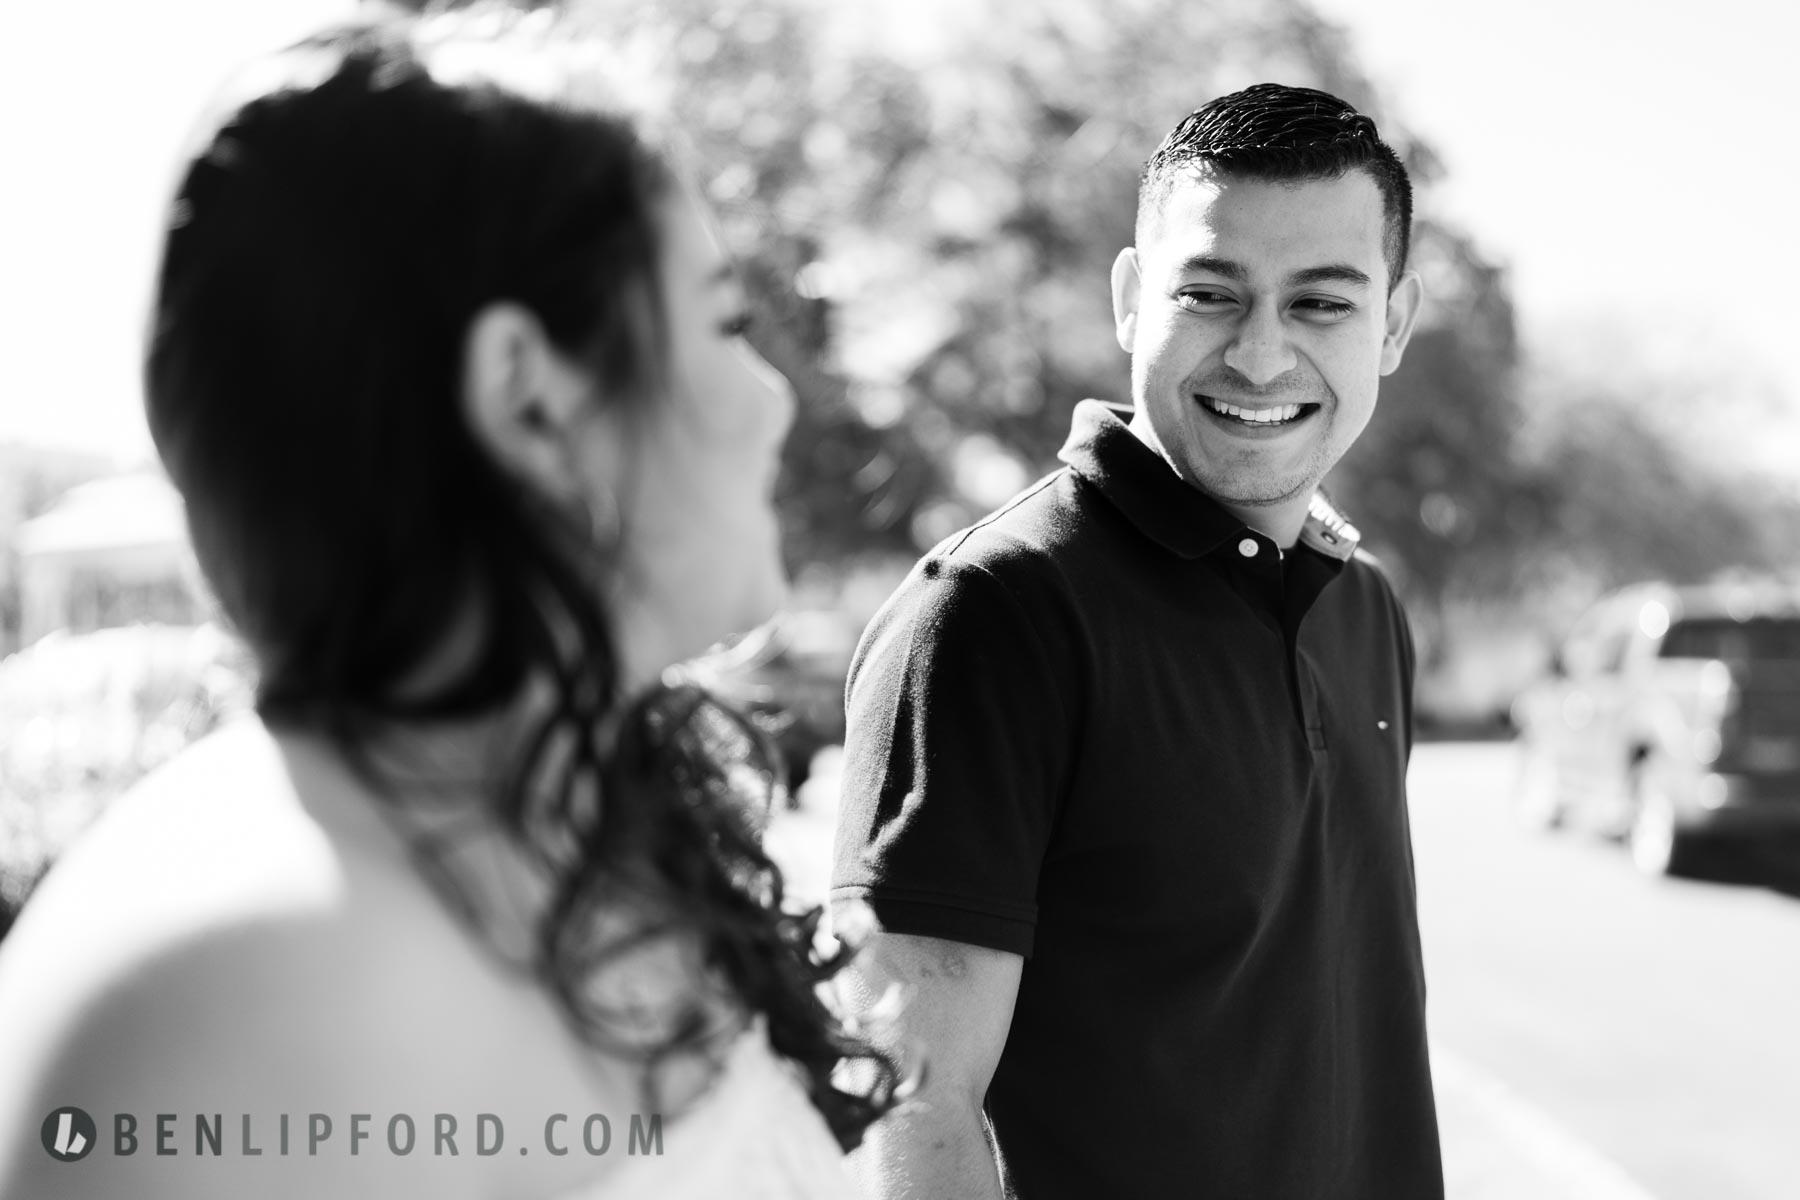 Isabella Jose Portrait Photography Birth Annoucement